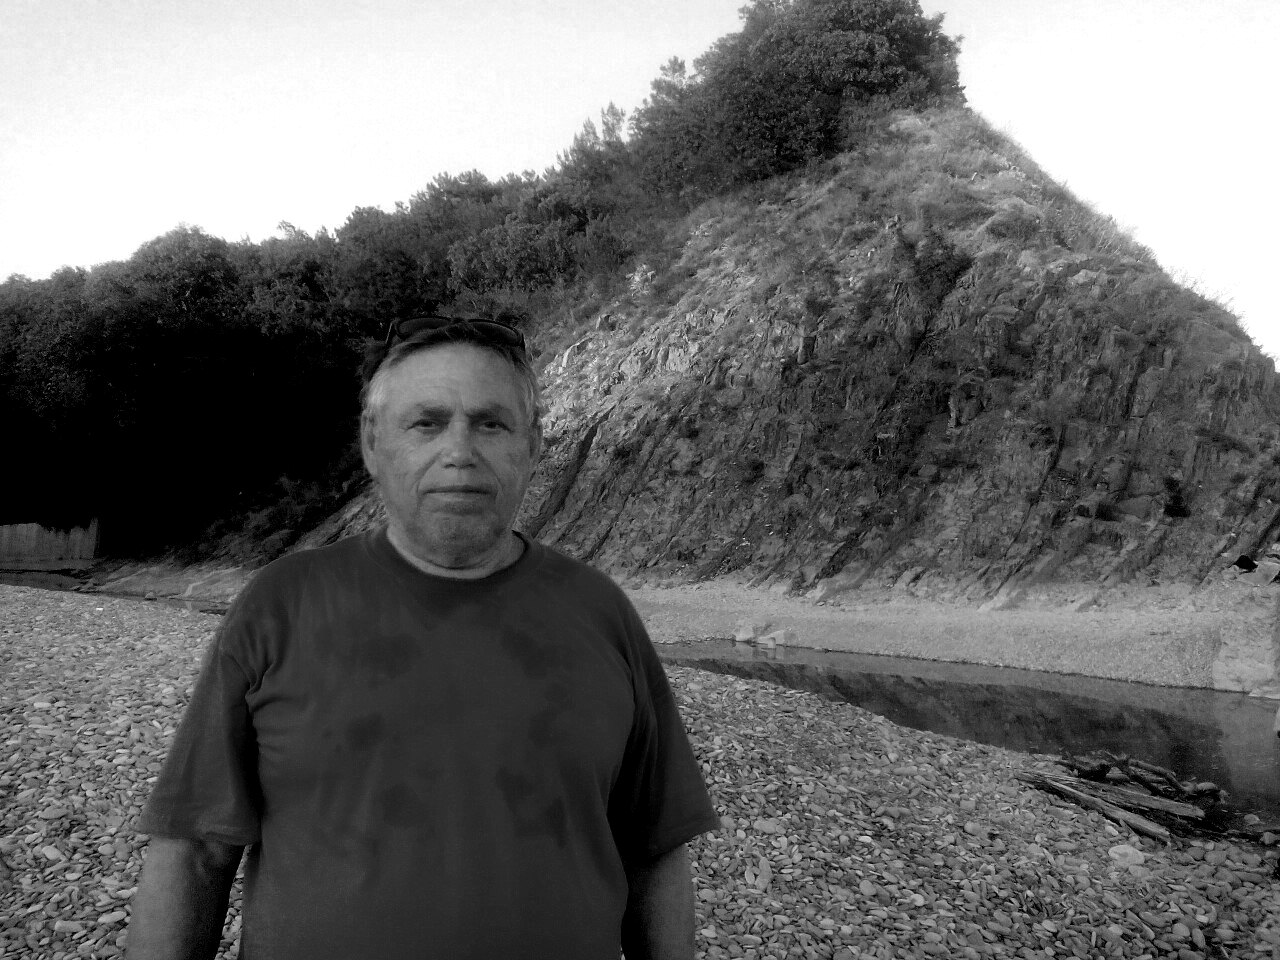 В Омске от коронавируса умер отец «солнечного» актера Саши Волгина #Омск #Общество #Сегодня